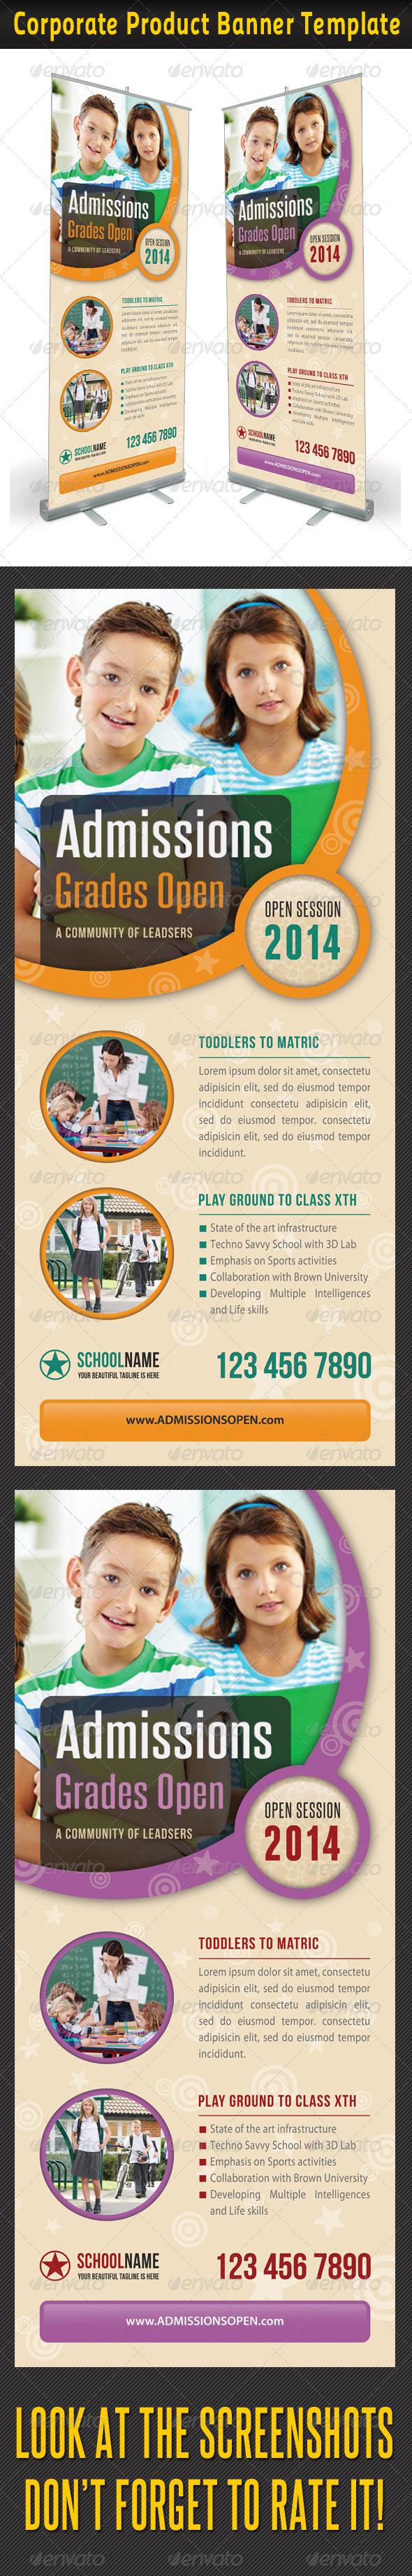 Junior School Promotion Banner Template - Signage Print Templates